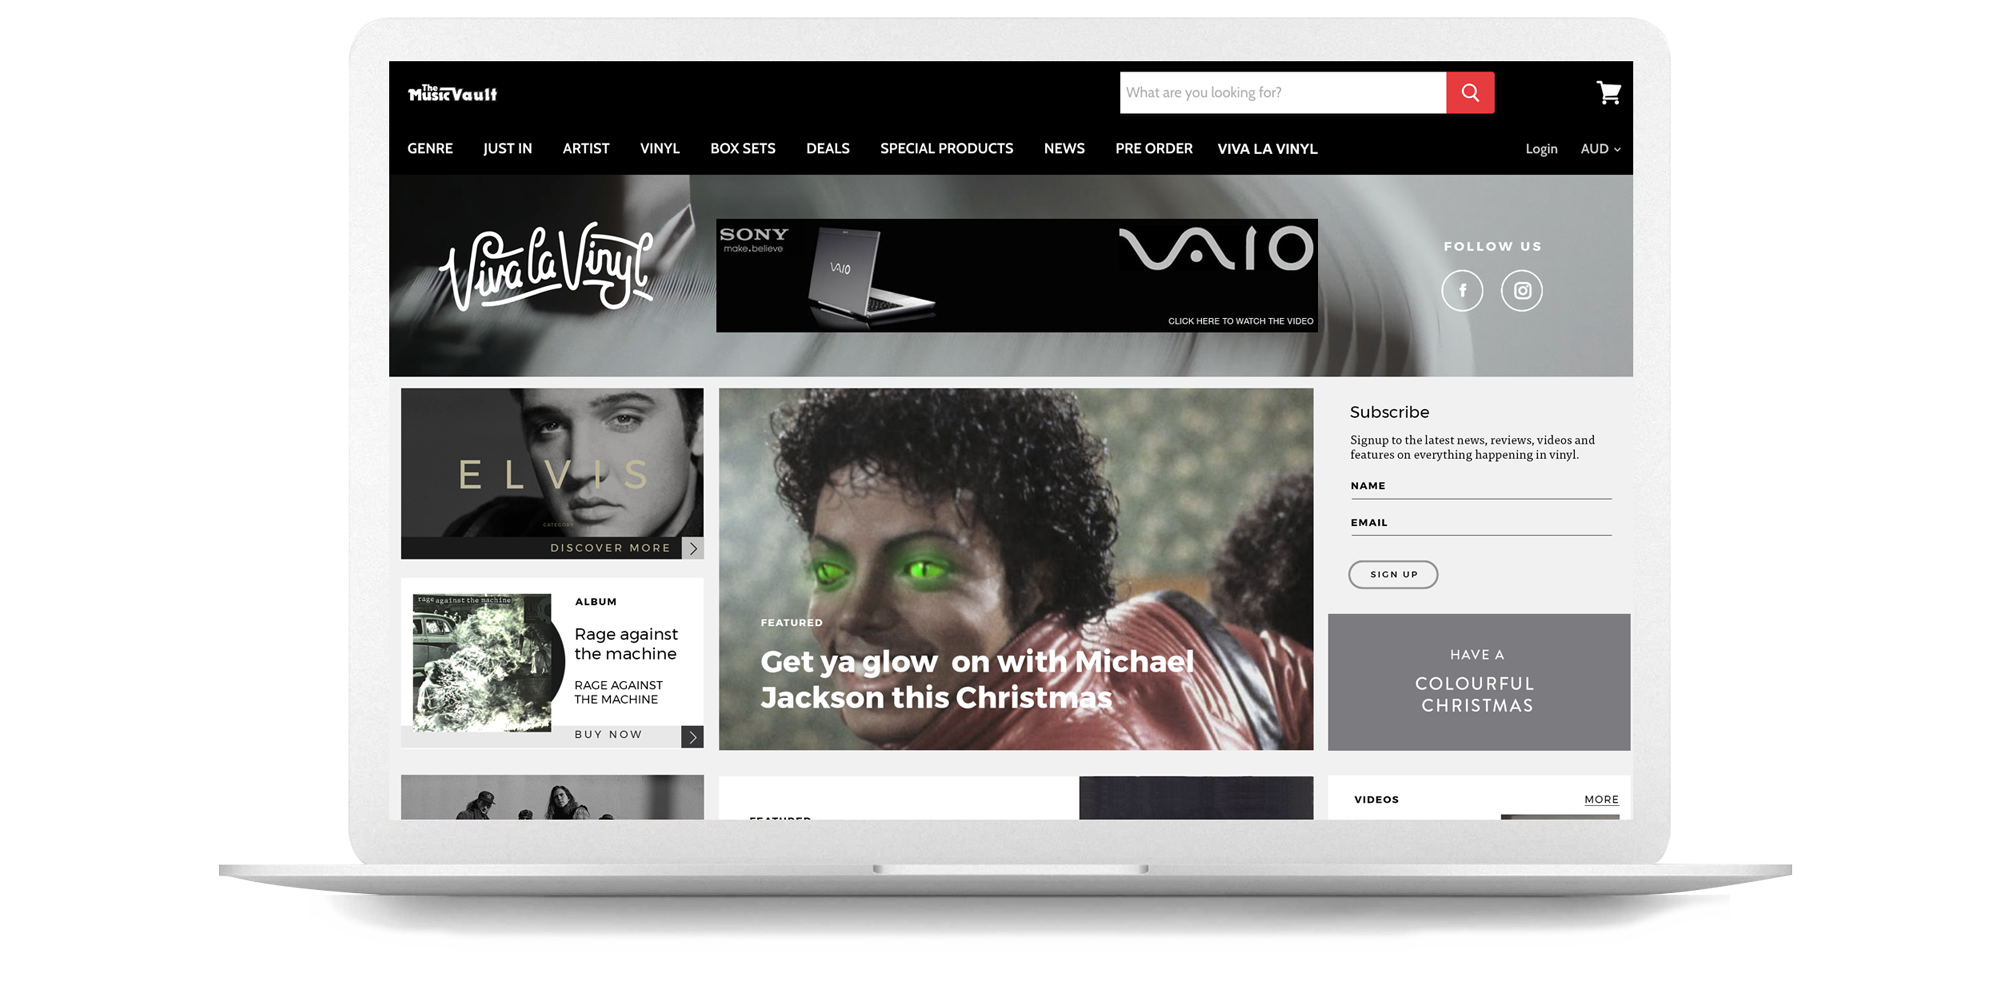 SonyMusic-VivaLaVinyl-Web-1.png